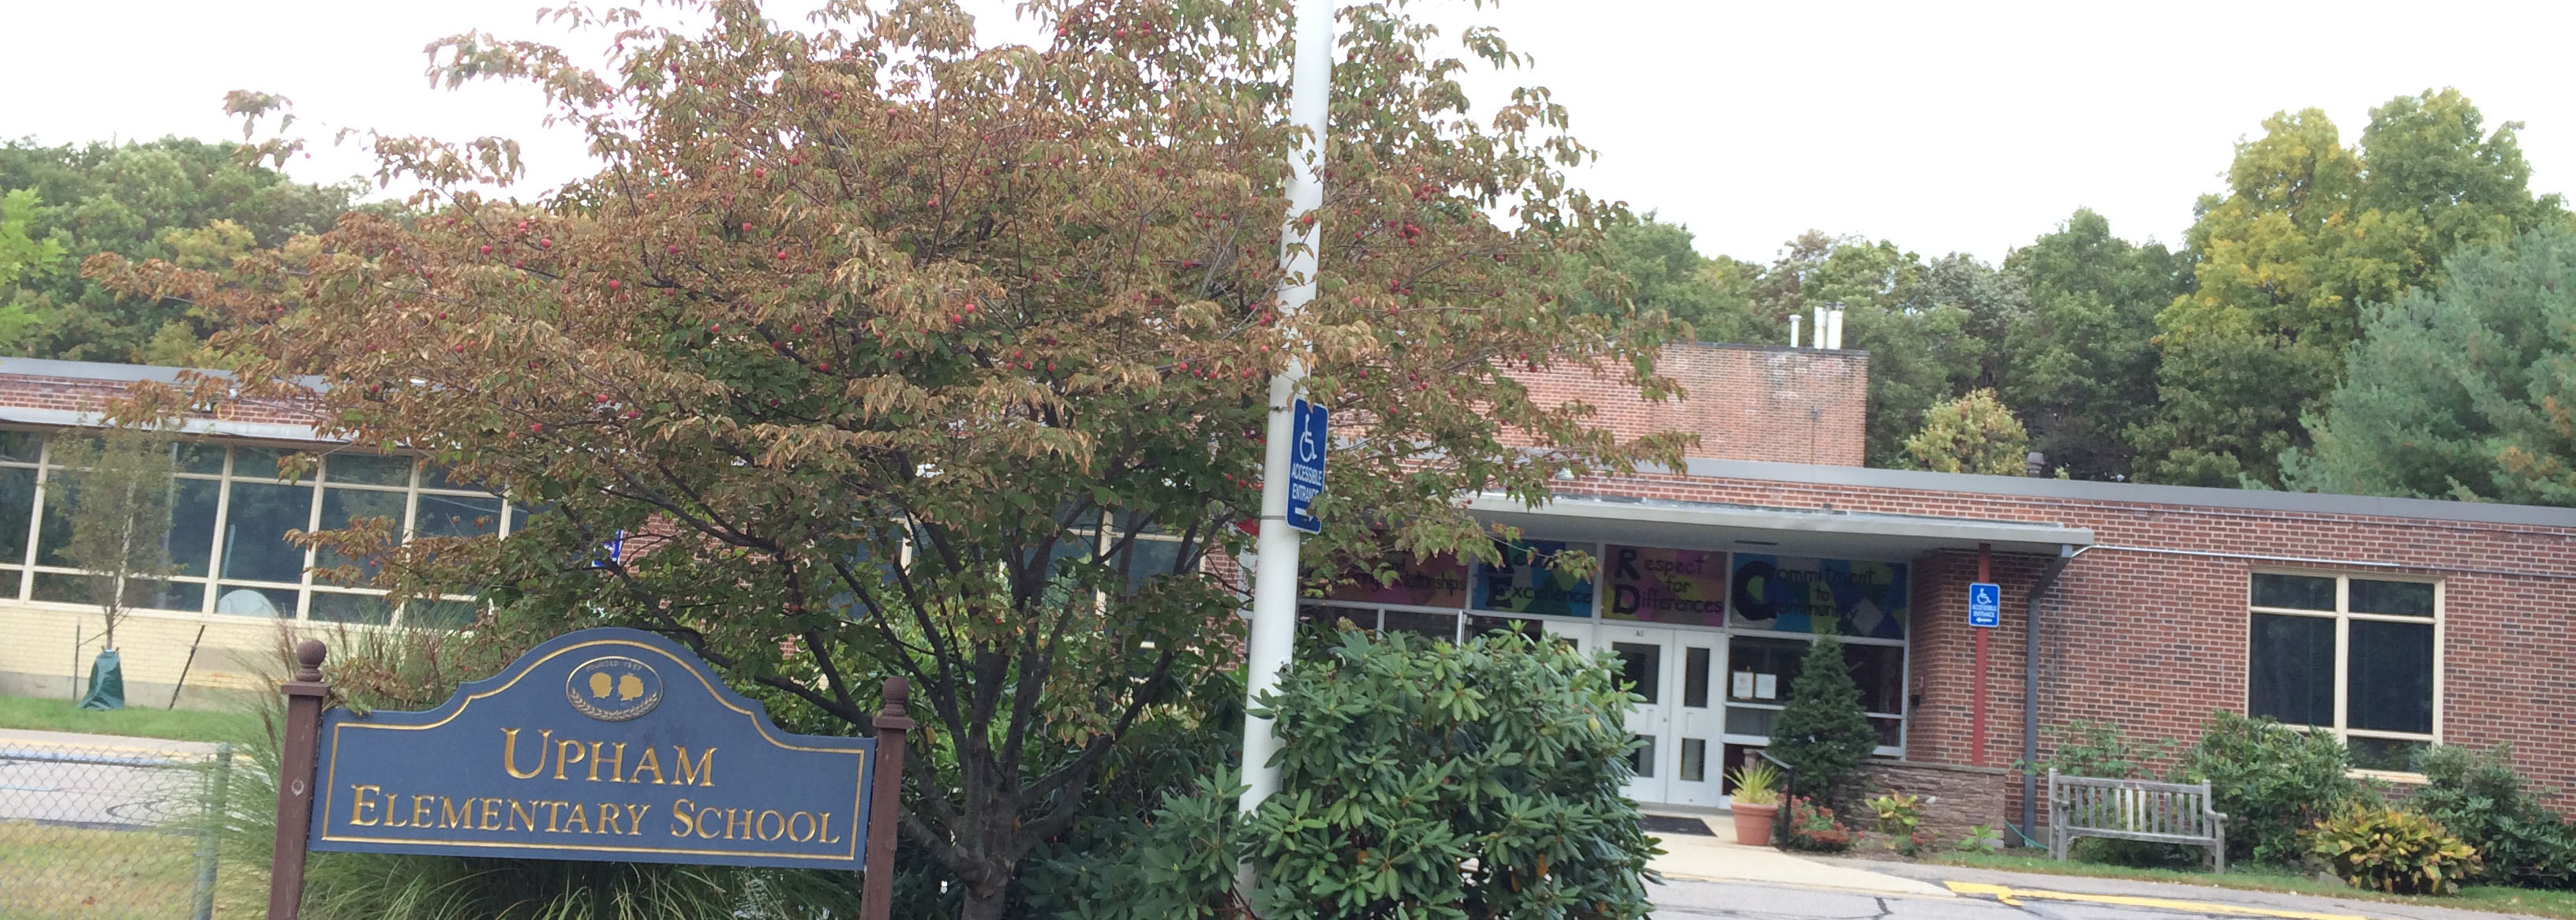 Upham Elementary School